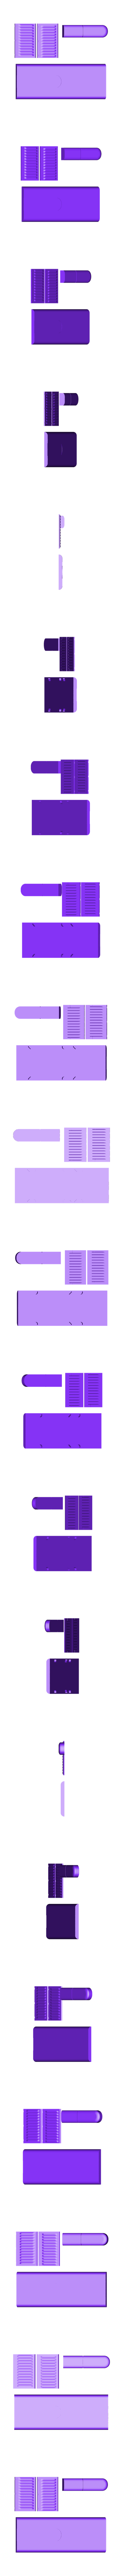 diesel01c_part14.stl Download STL file Diesel-01-C locomotive - ERS and others compatibile, FDM 3D printable • 3D printer object, euroreprap_eu